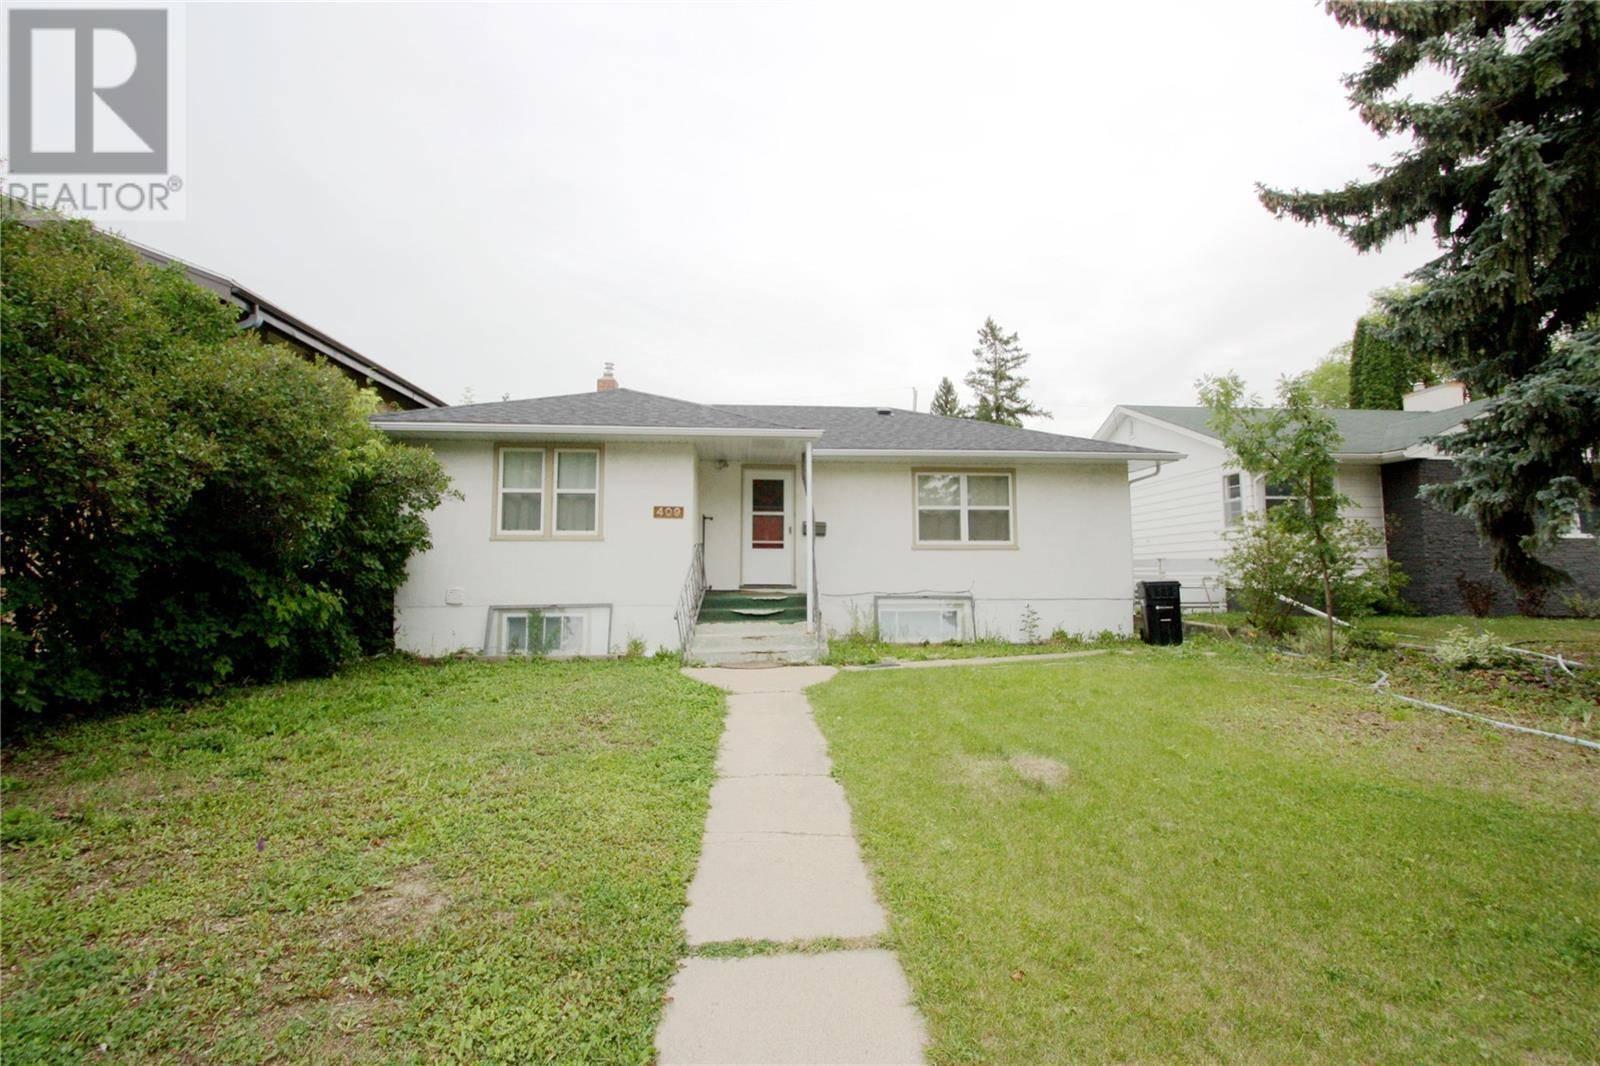 House for sale at 409 Cumberland Ave S Saskatoon Saskatchewan - MLS: SK782763